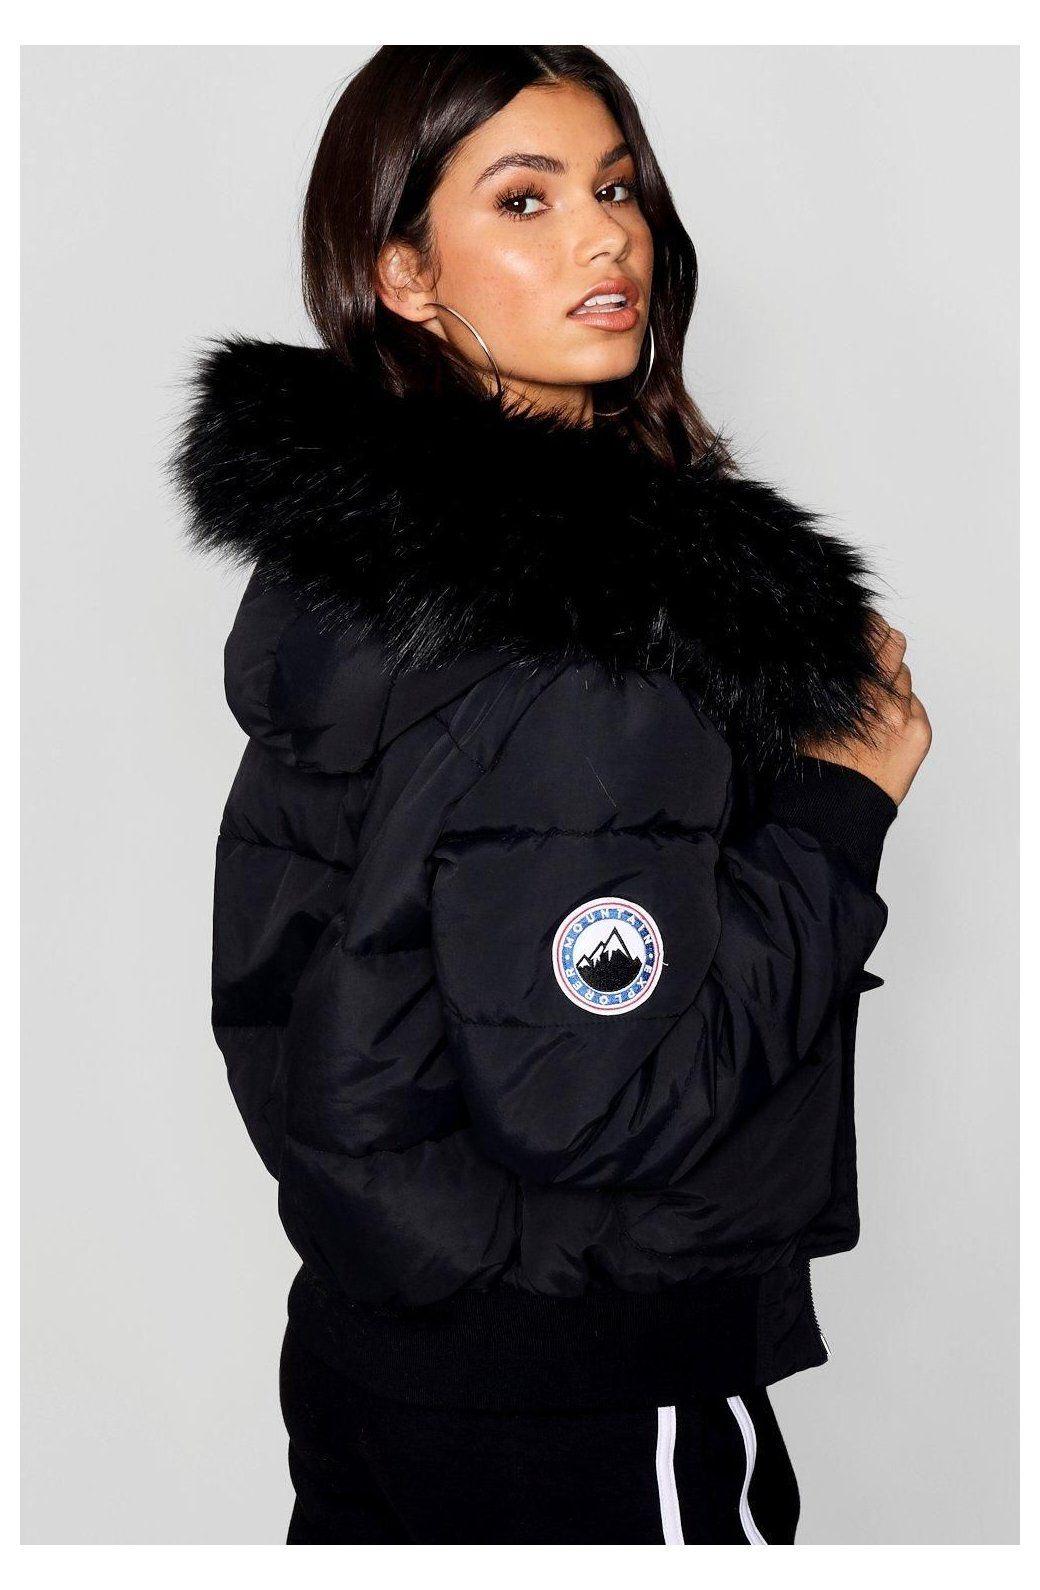 Black Faux Fur Hood Crop Puffer Boohoo Puffer Jacket With Fur Hood Pufferjacketwithfurhood Womens Black Faux Fur Hood Crop Puffe Ropa De Moda Ropa Moda [ 1590 x 1040 Pixel ]